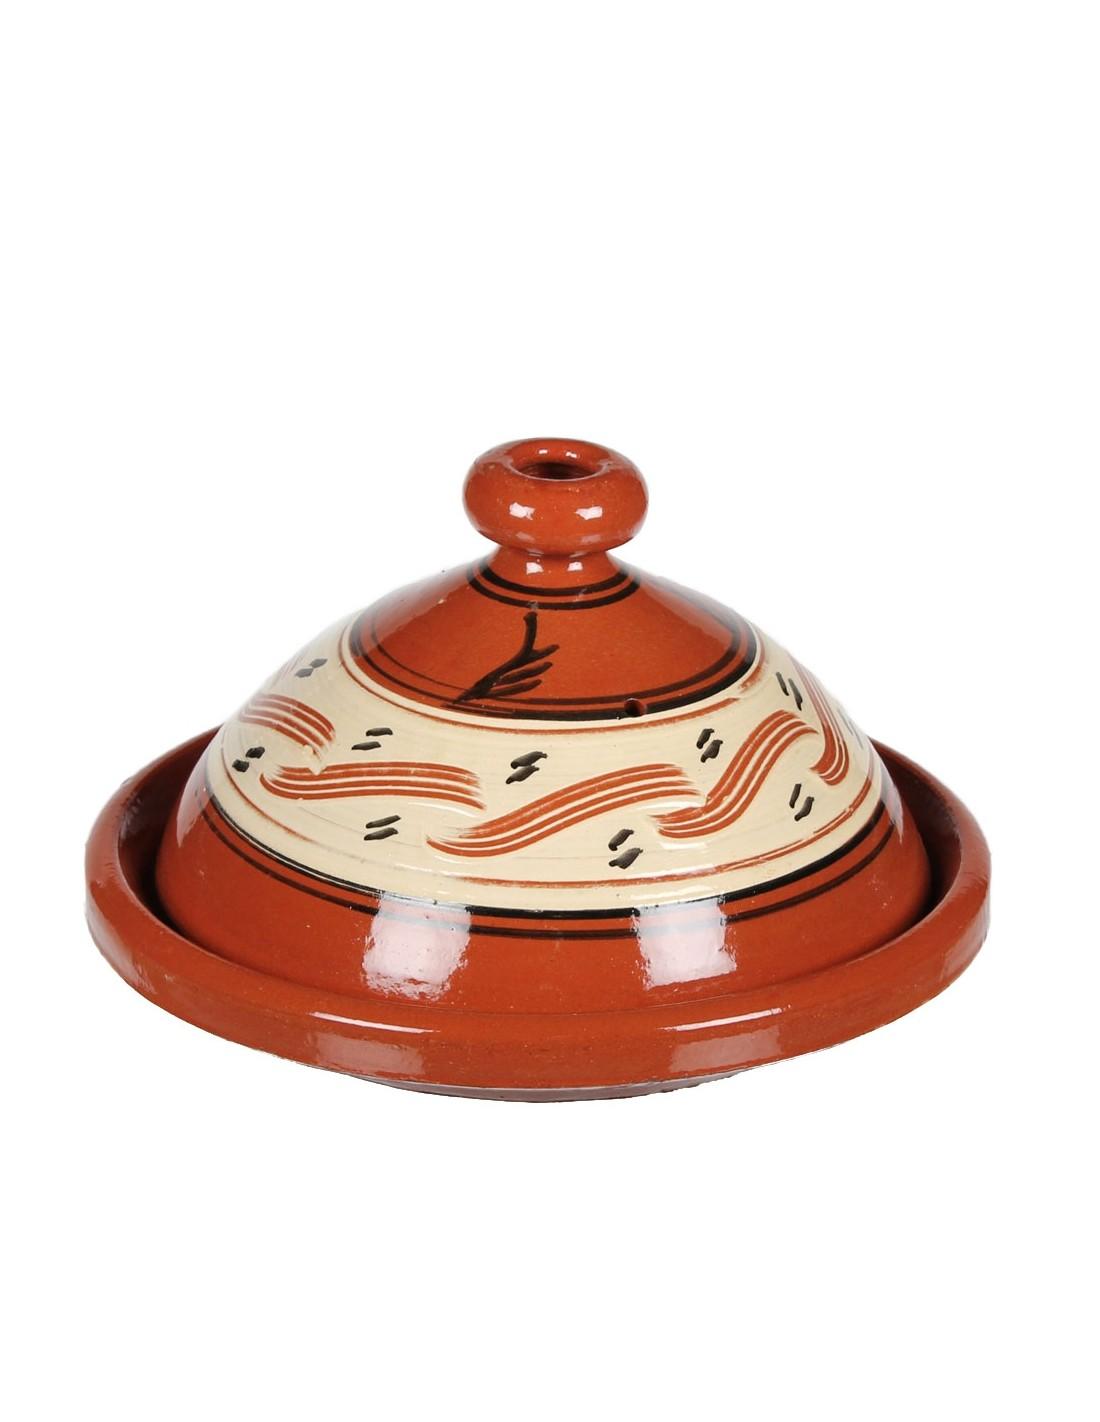 Marokkanisches Kochgeschirr Tajinen Feuerstellen Albena Shop